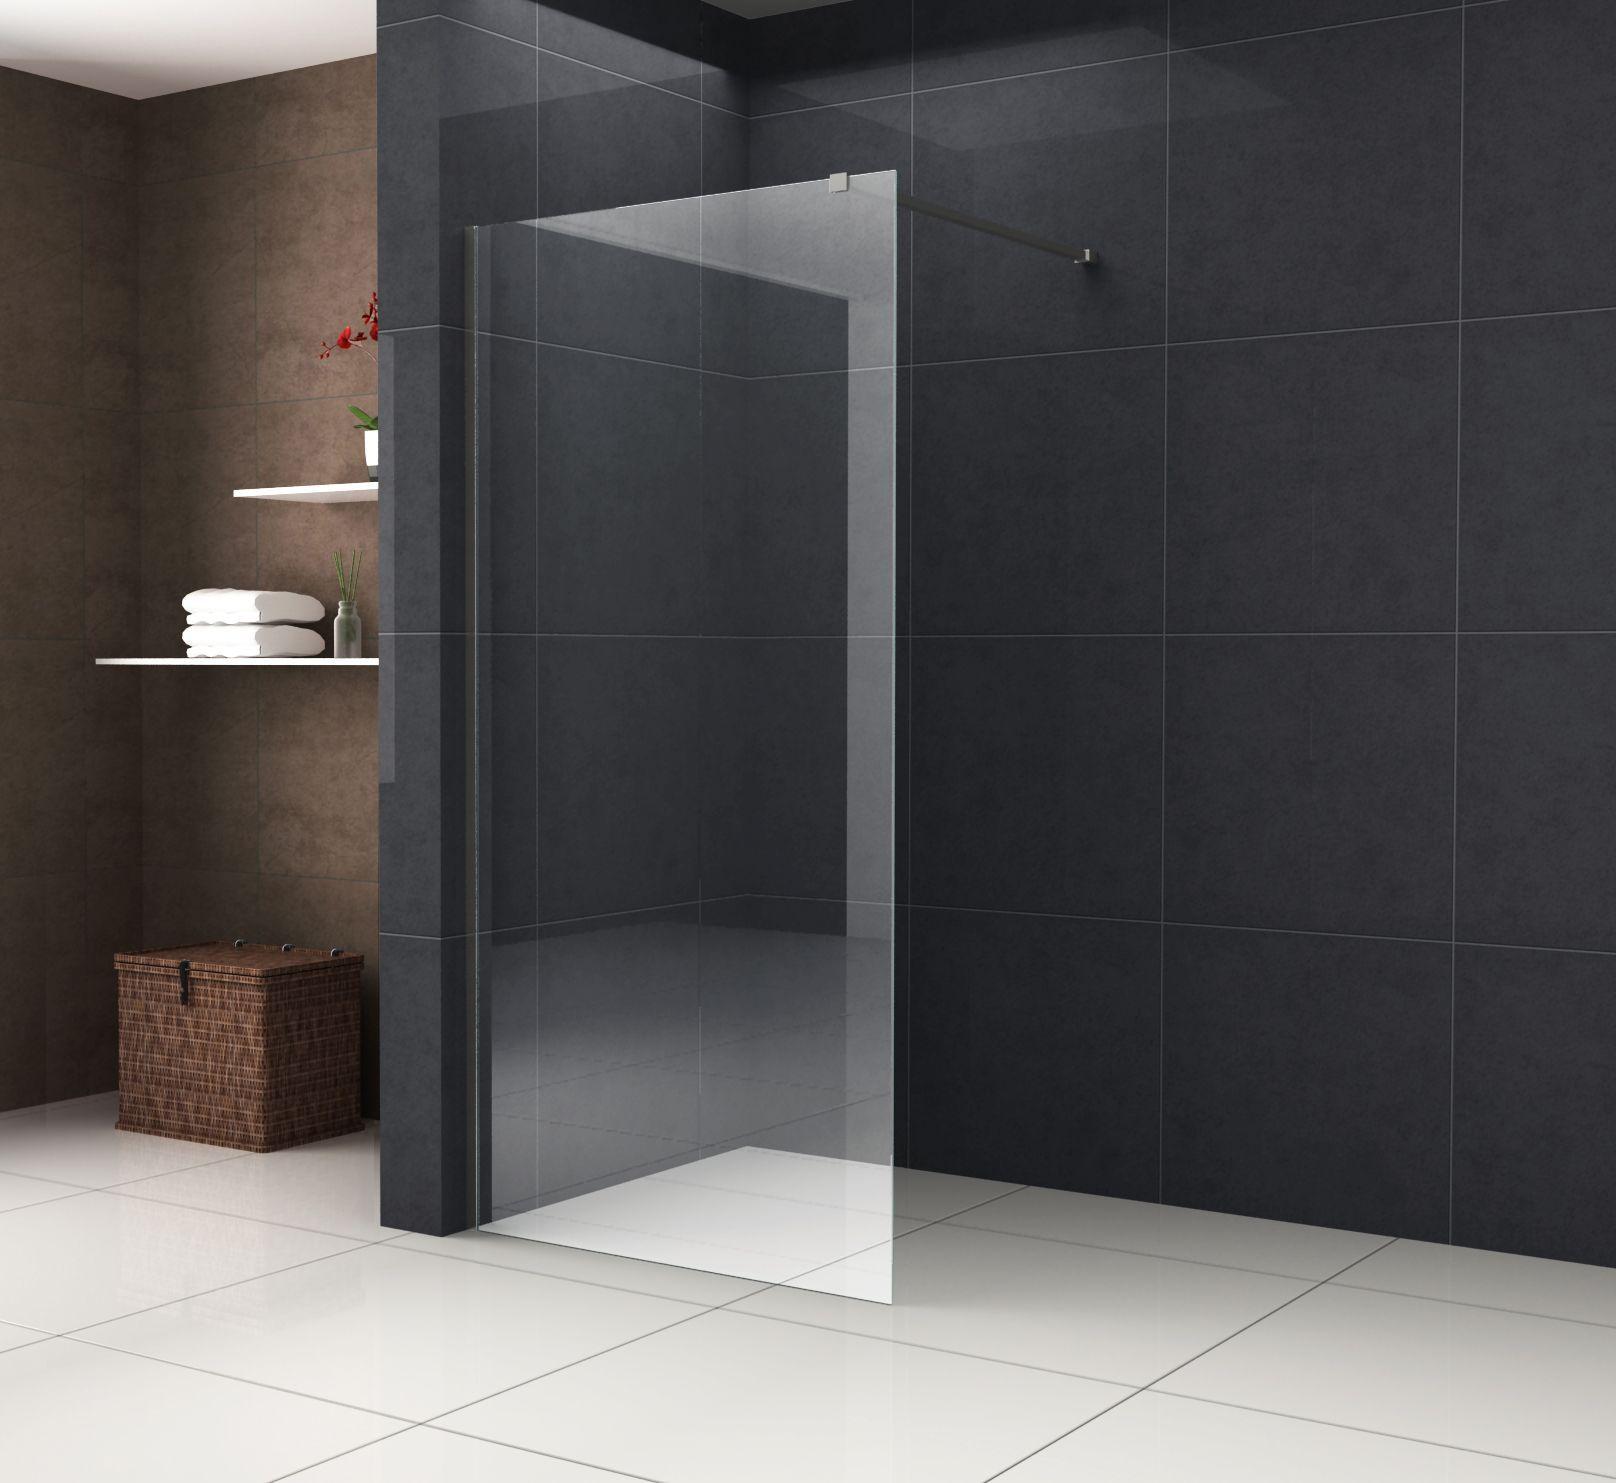 Walk In Duschwande Seite 5 Glasdeals Duschwand Dusche Badezimmerideen